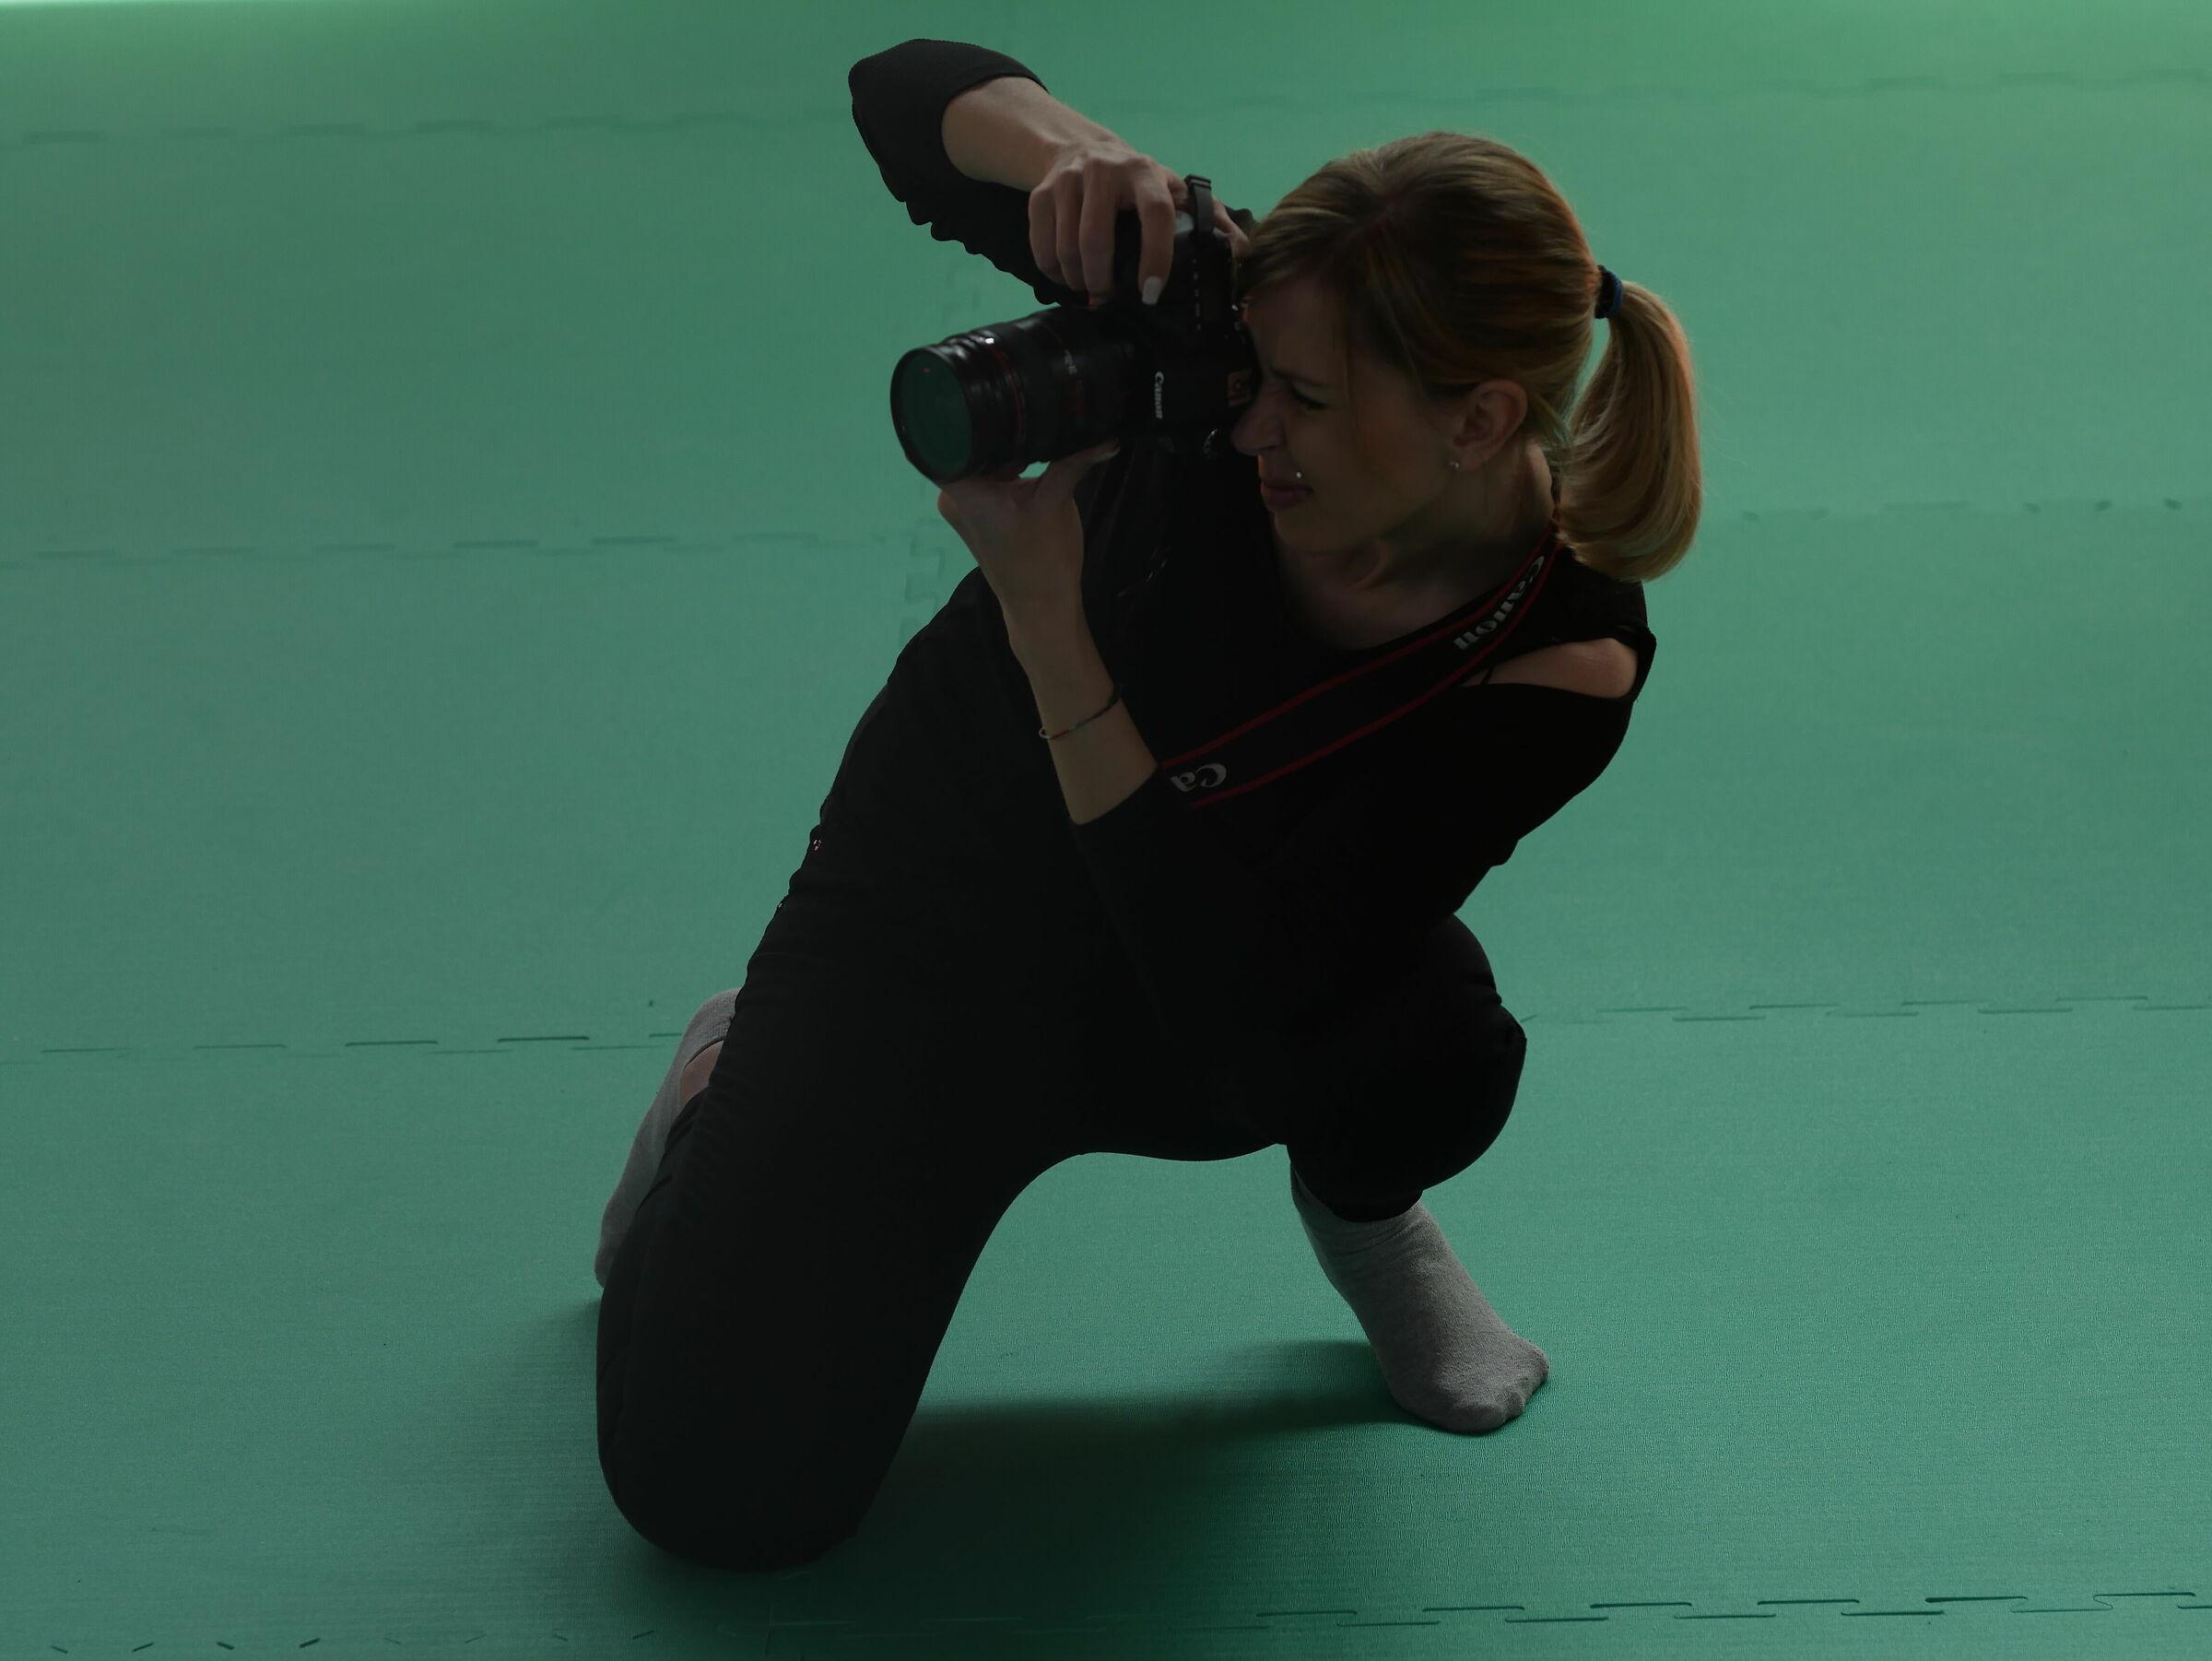 A ninja at the judo tournament...